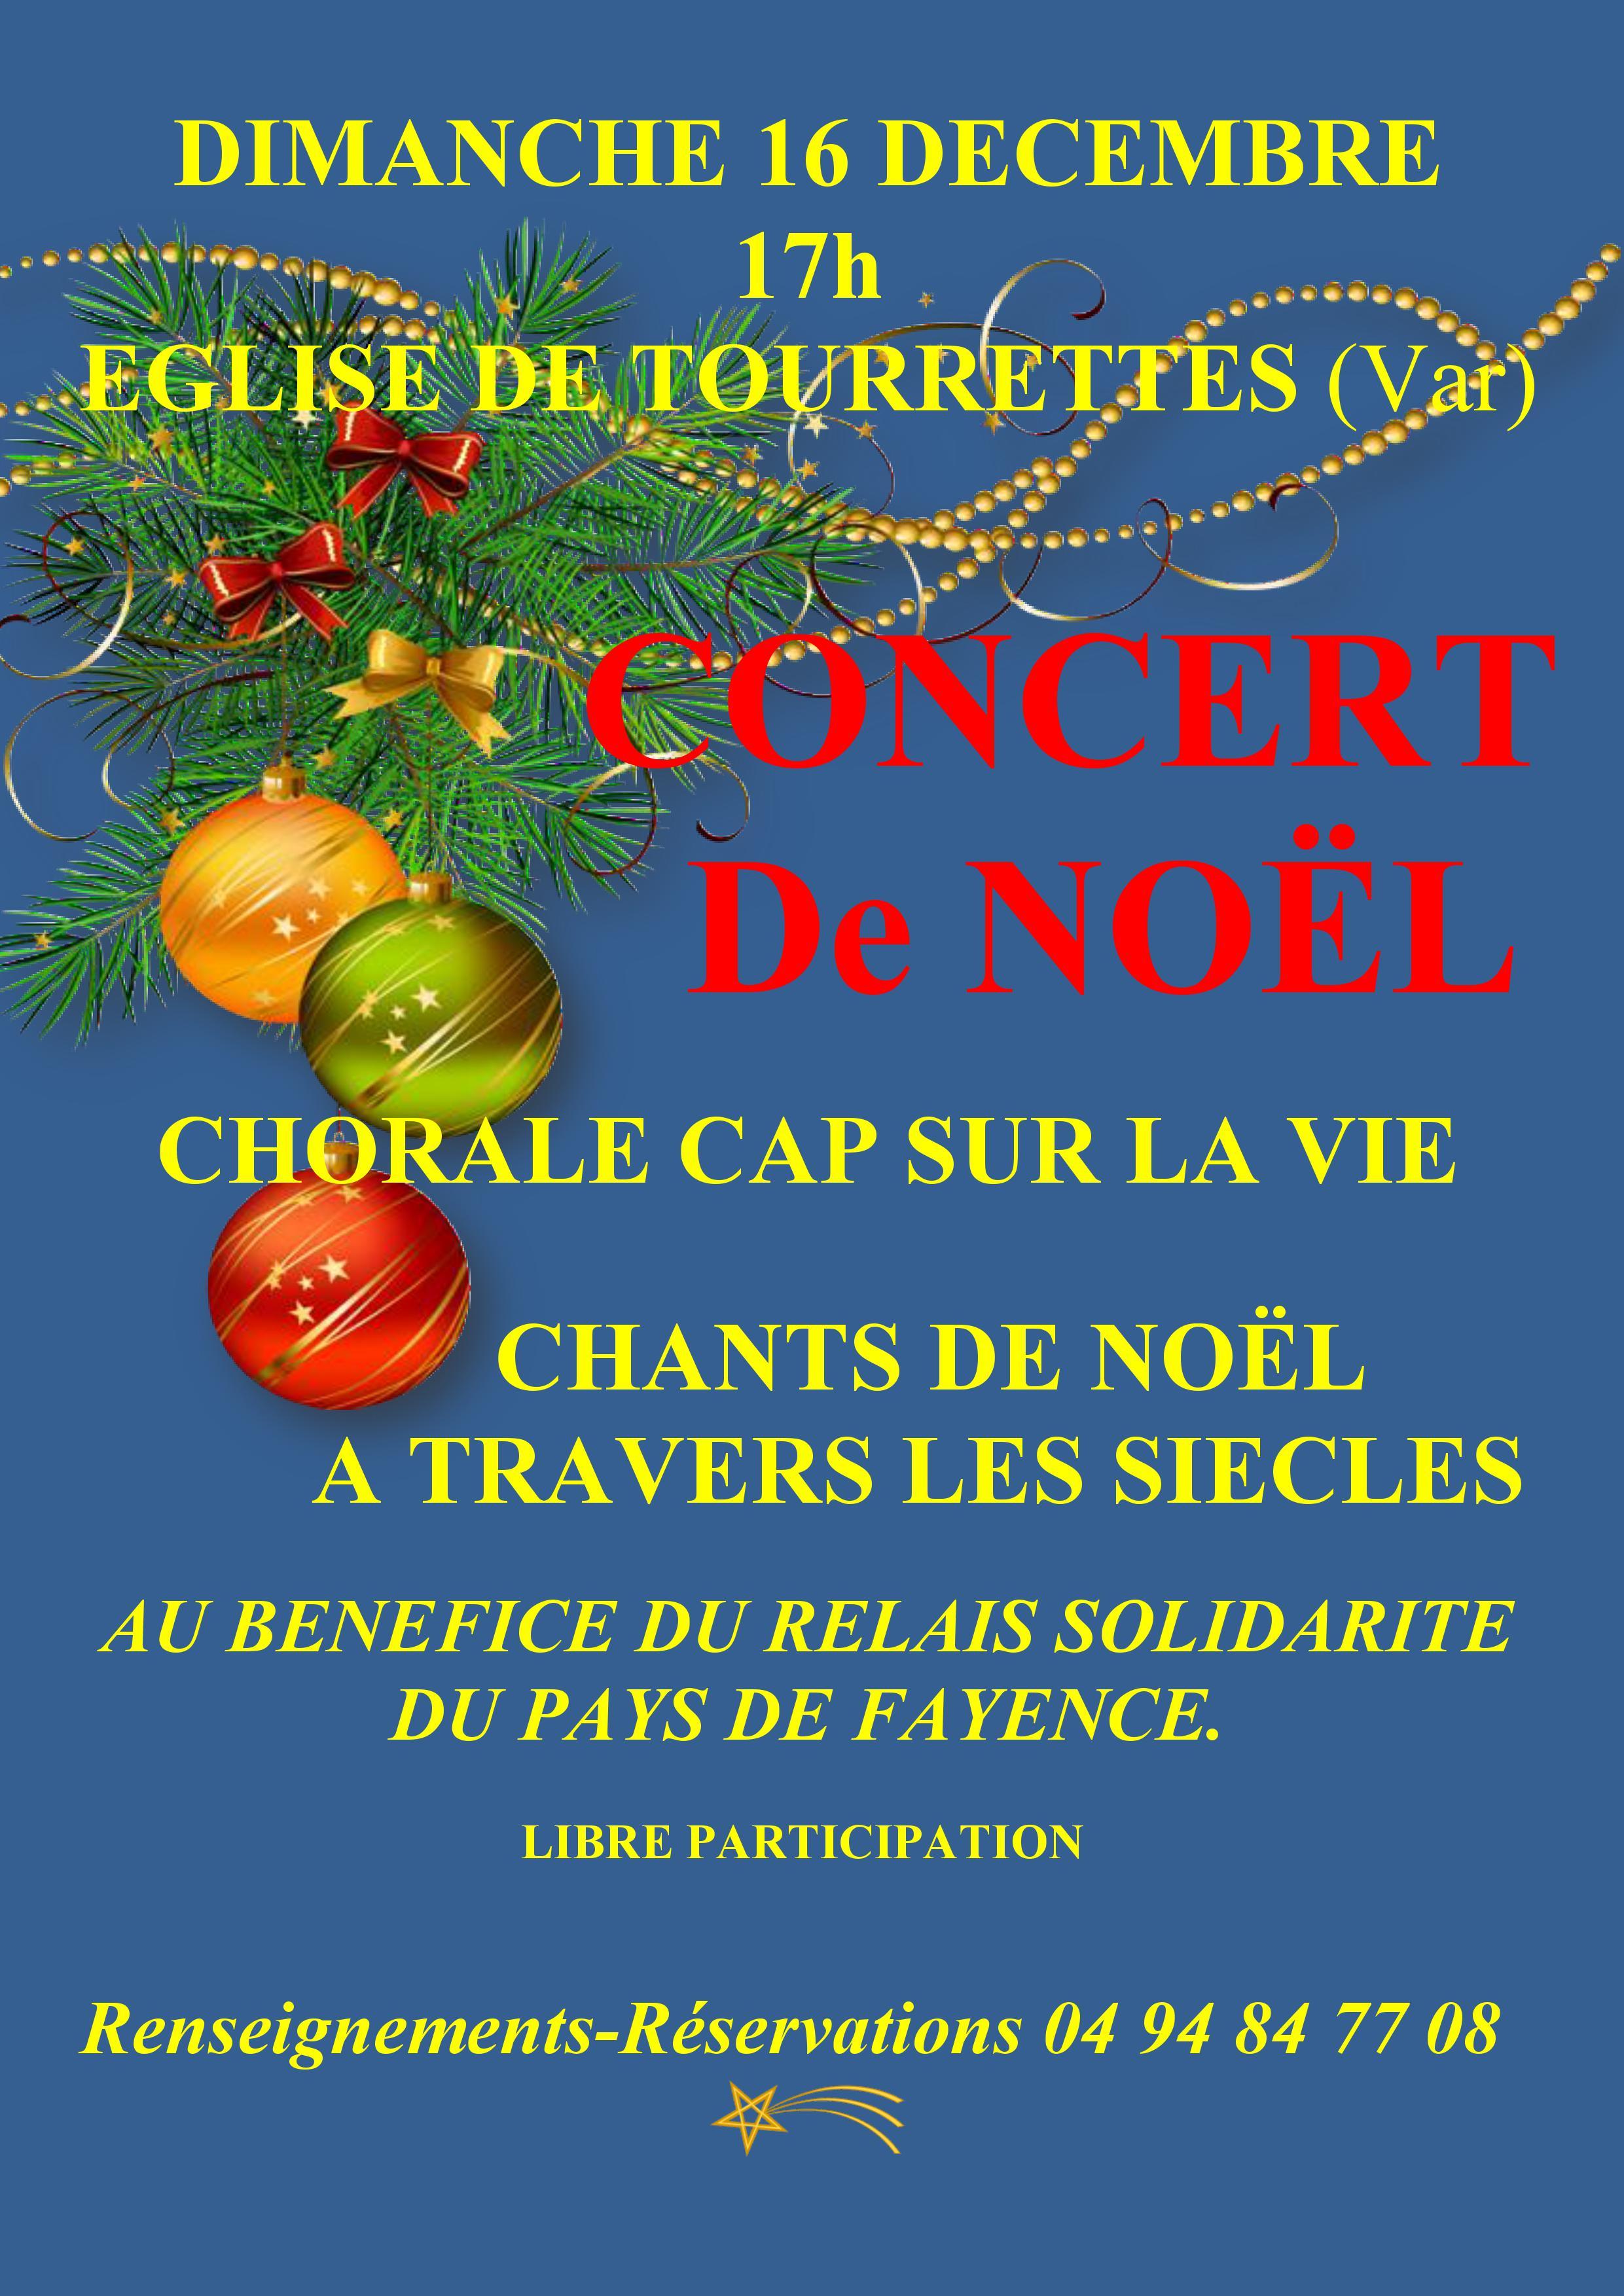 Concert Noel 2018 - Affiche